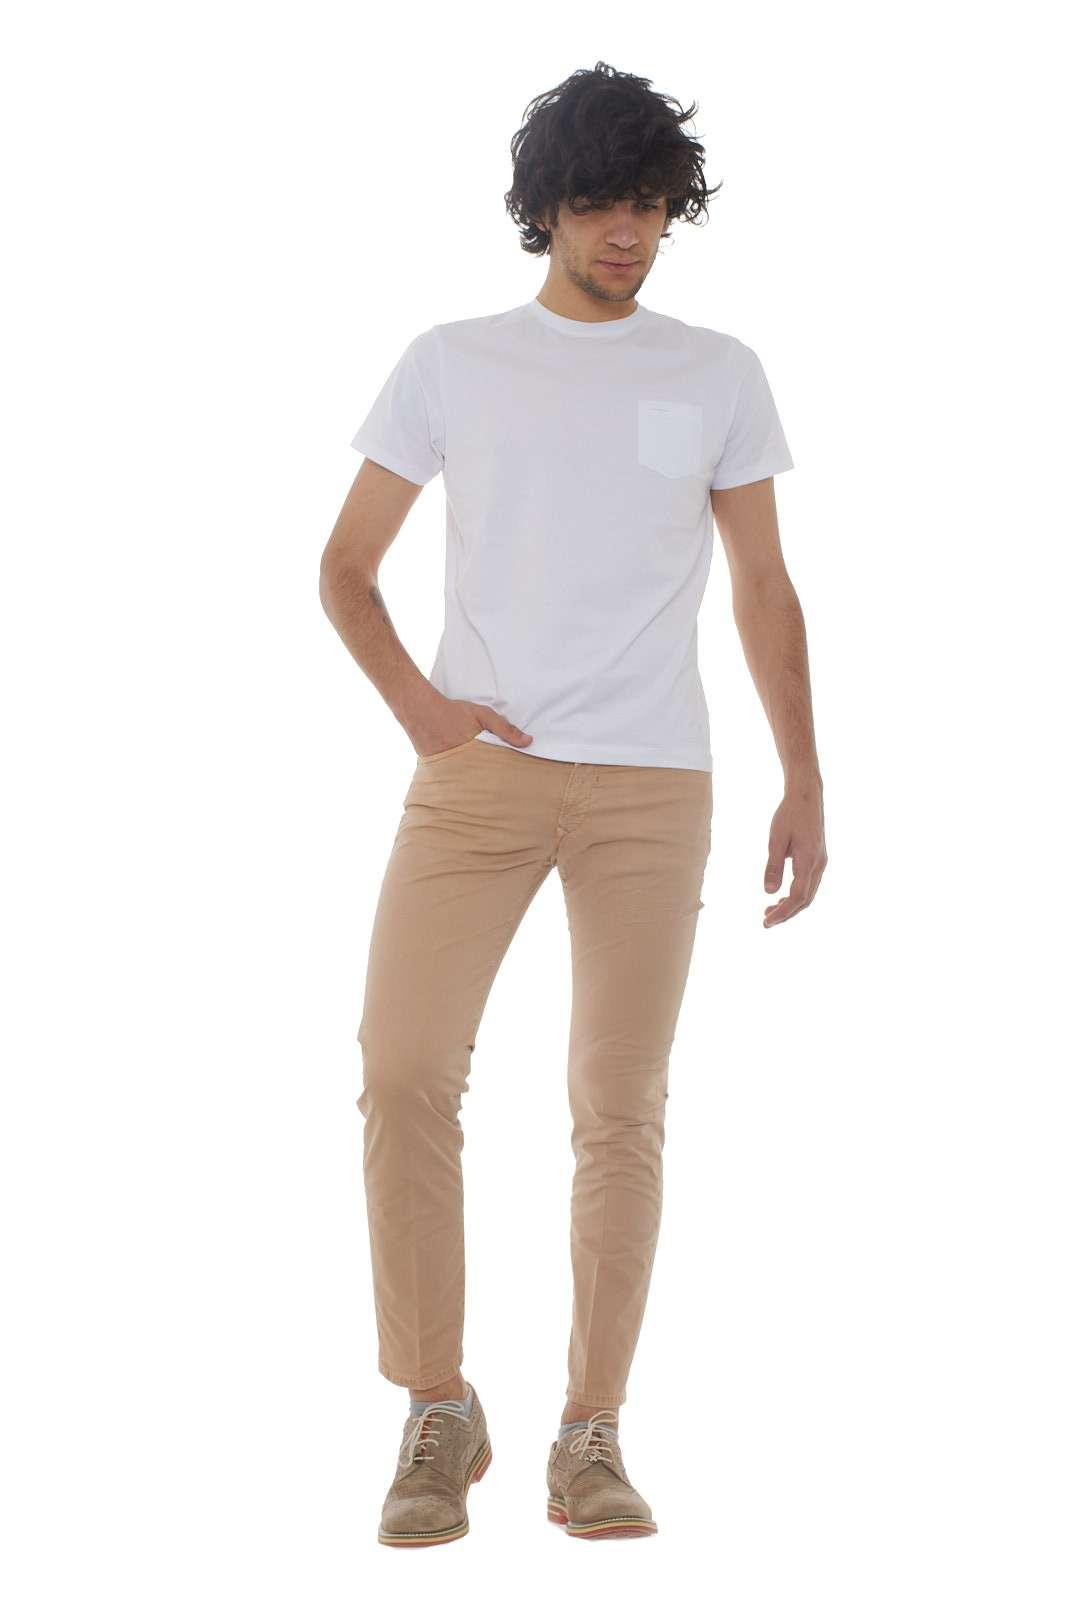 https://www.parmax.com/media/catalog/product/a/i/PE-outlet_parmax-pantaloni-uomo-Michael-Coal-GEORGE2595-D.jpg